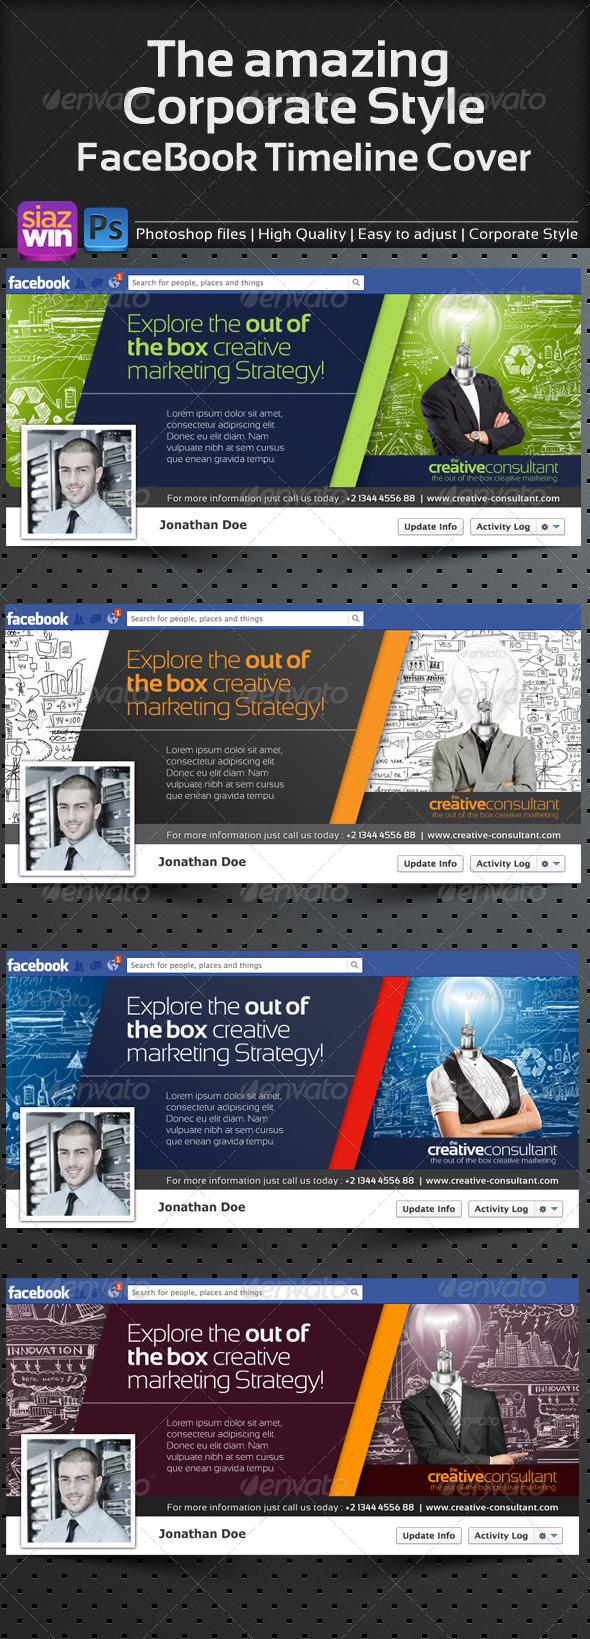 The Corporate FB Timeline 01 - Facebook Timeline Covers Social Media